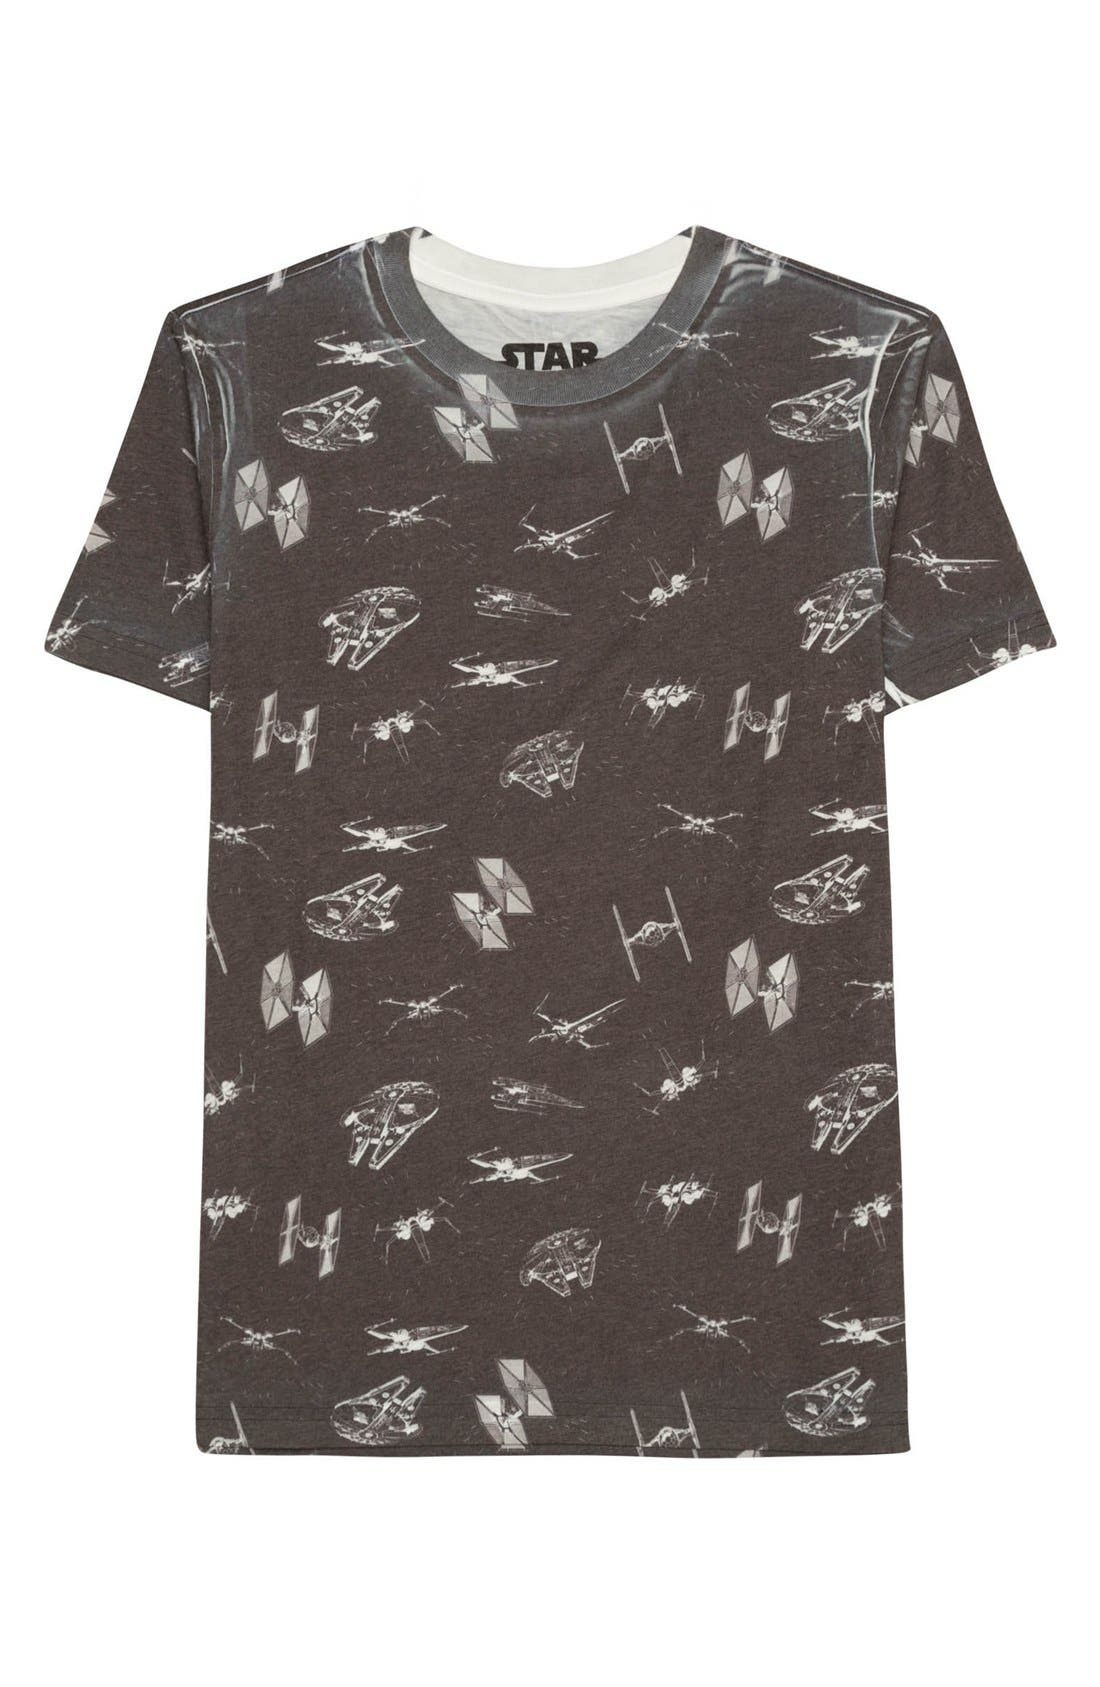 JEM Star Wars™ Print T-Shirt